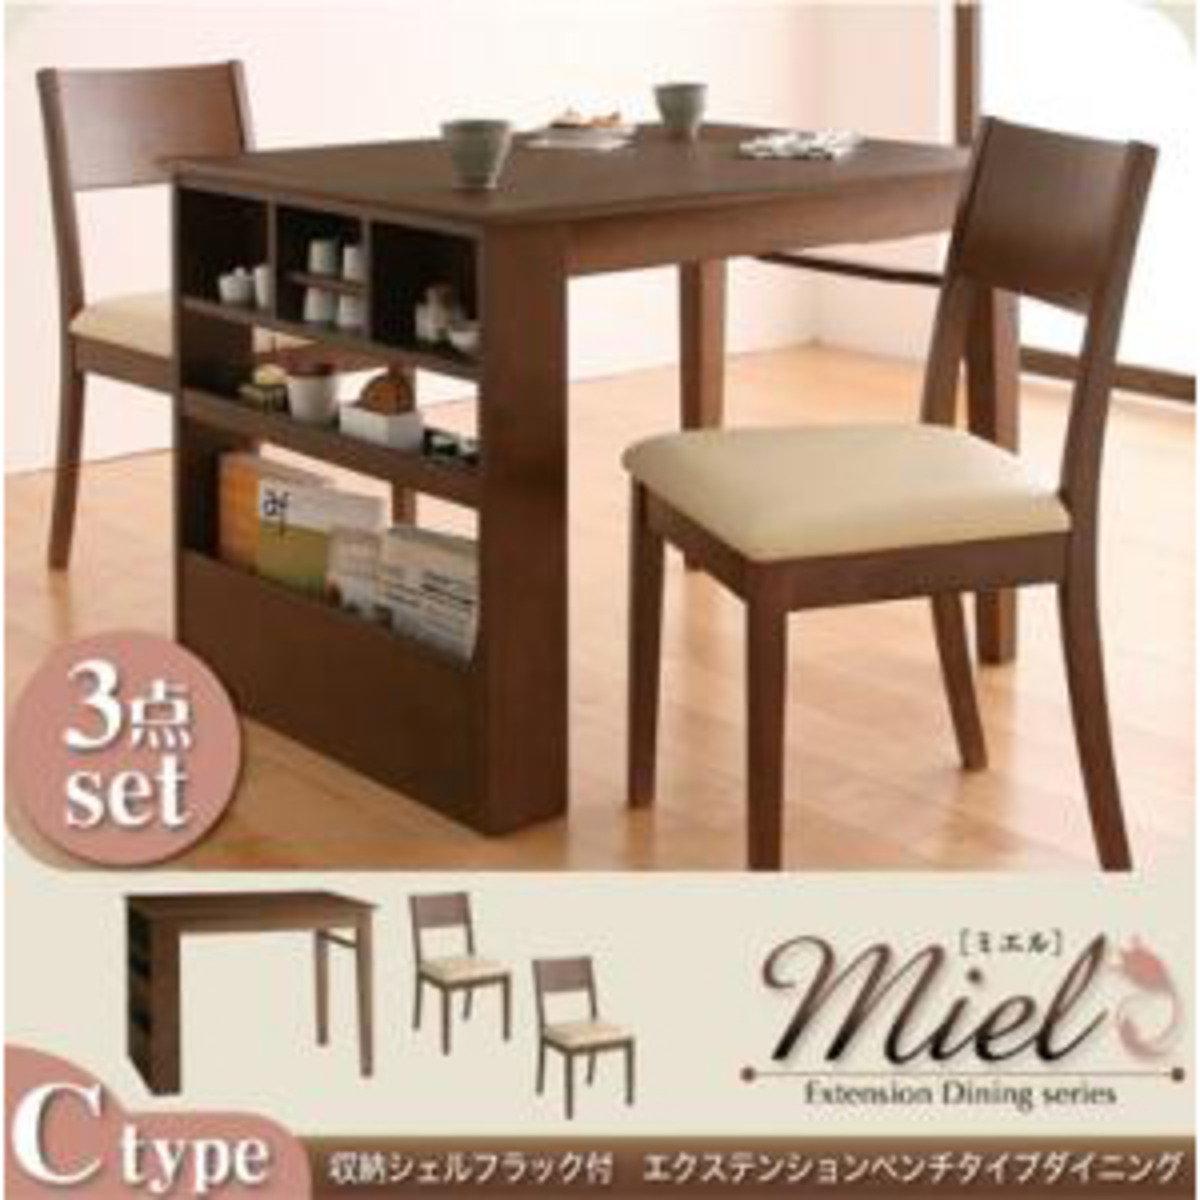 Mile伸縮收納餐桌-3点C